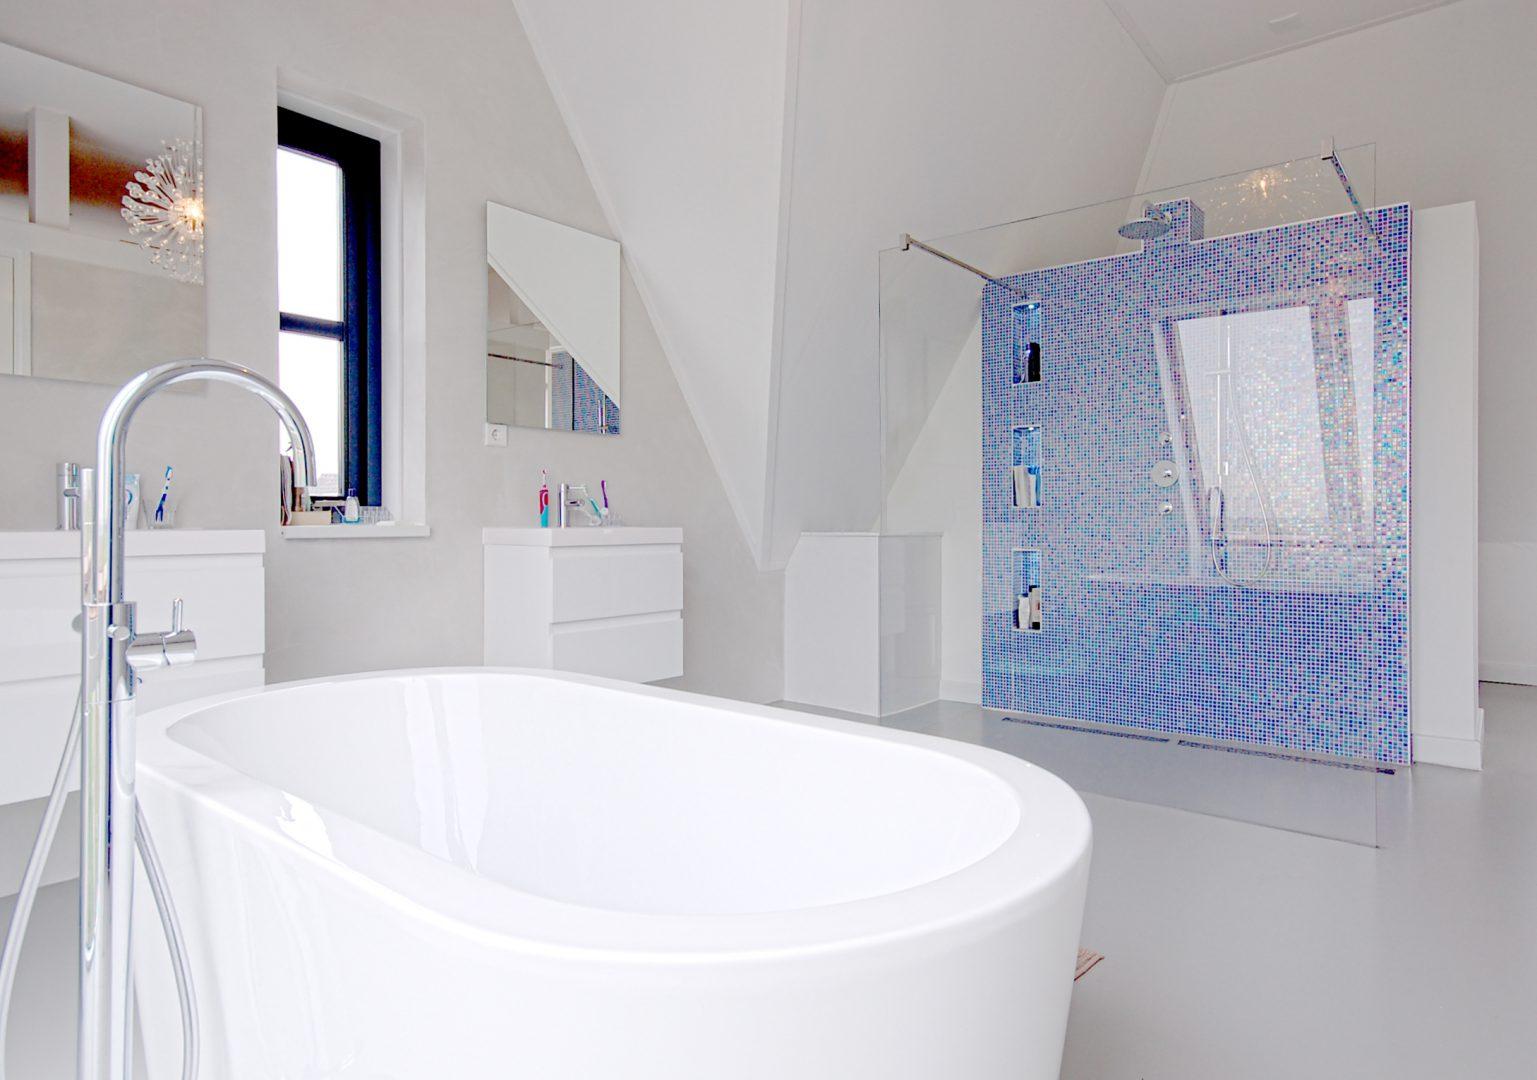 Duurzame Villa te Limmen Zijlstra Schipper Architecten Noord-Holland badkamer